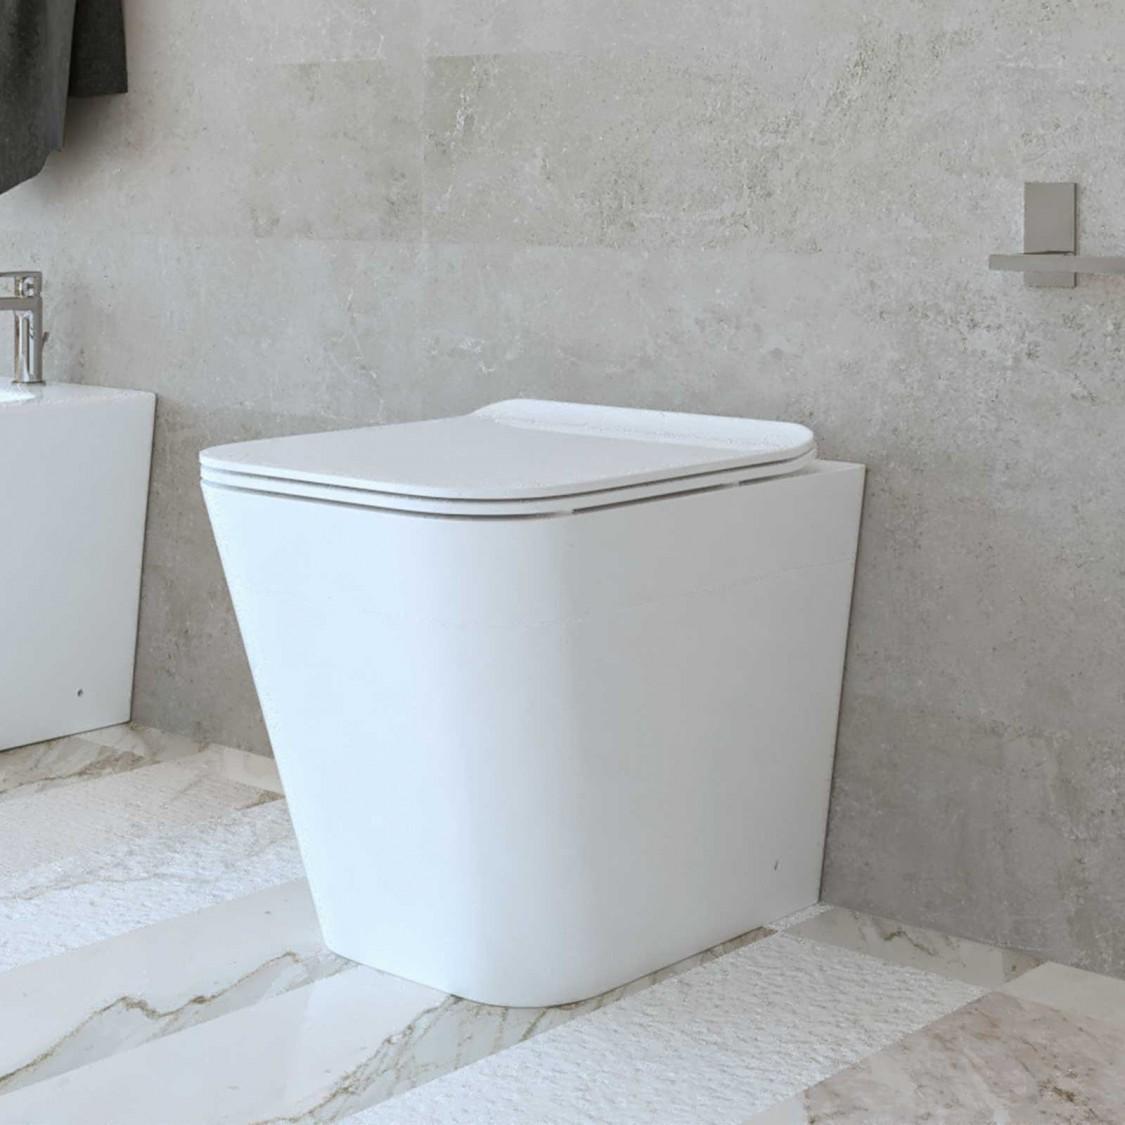 Vasi WC singoli al miglior prezzo | Shop Online Idroplus